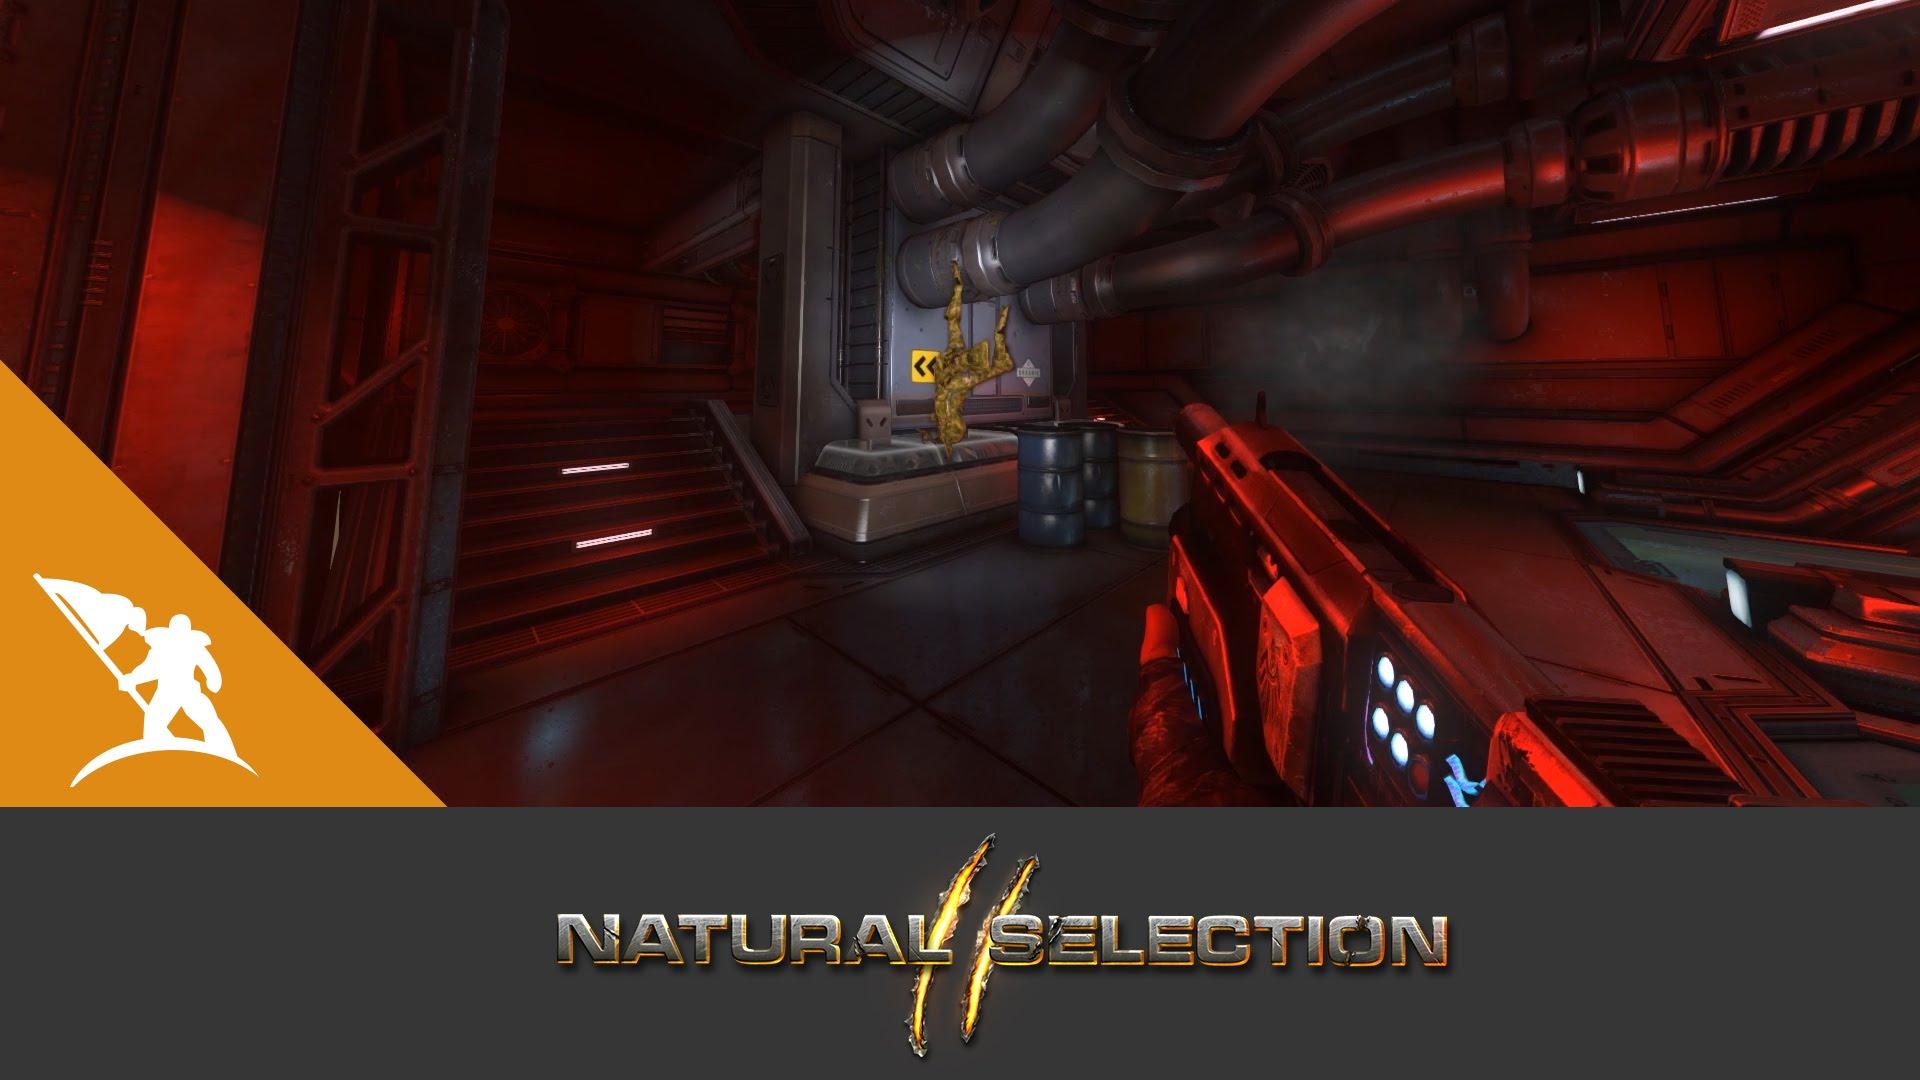 Natural Selection 2 Development Recap: June 2016